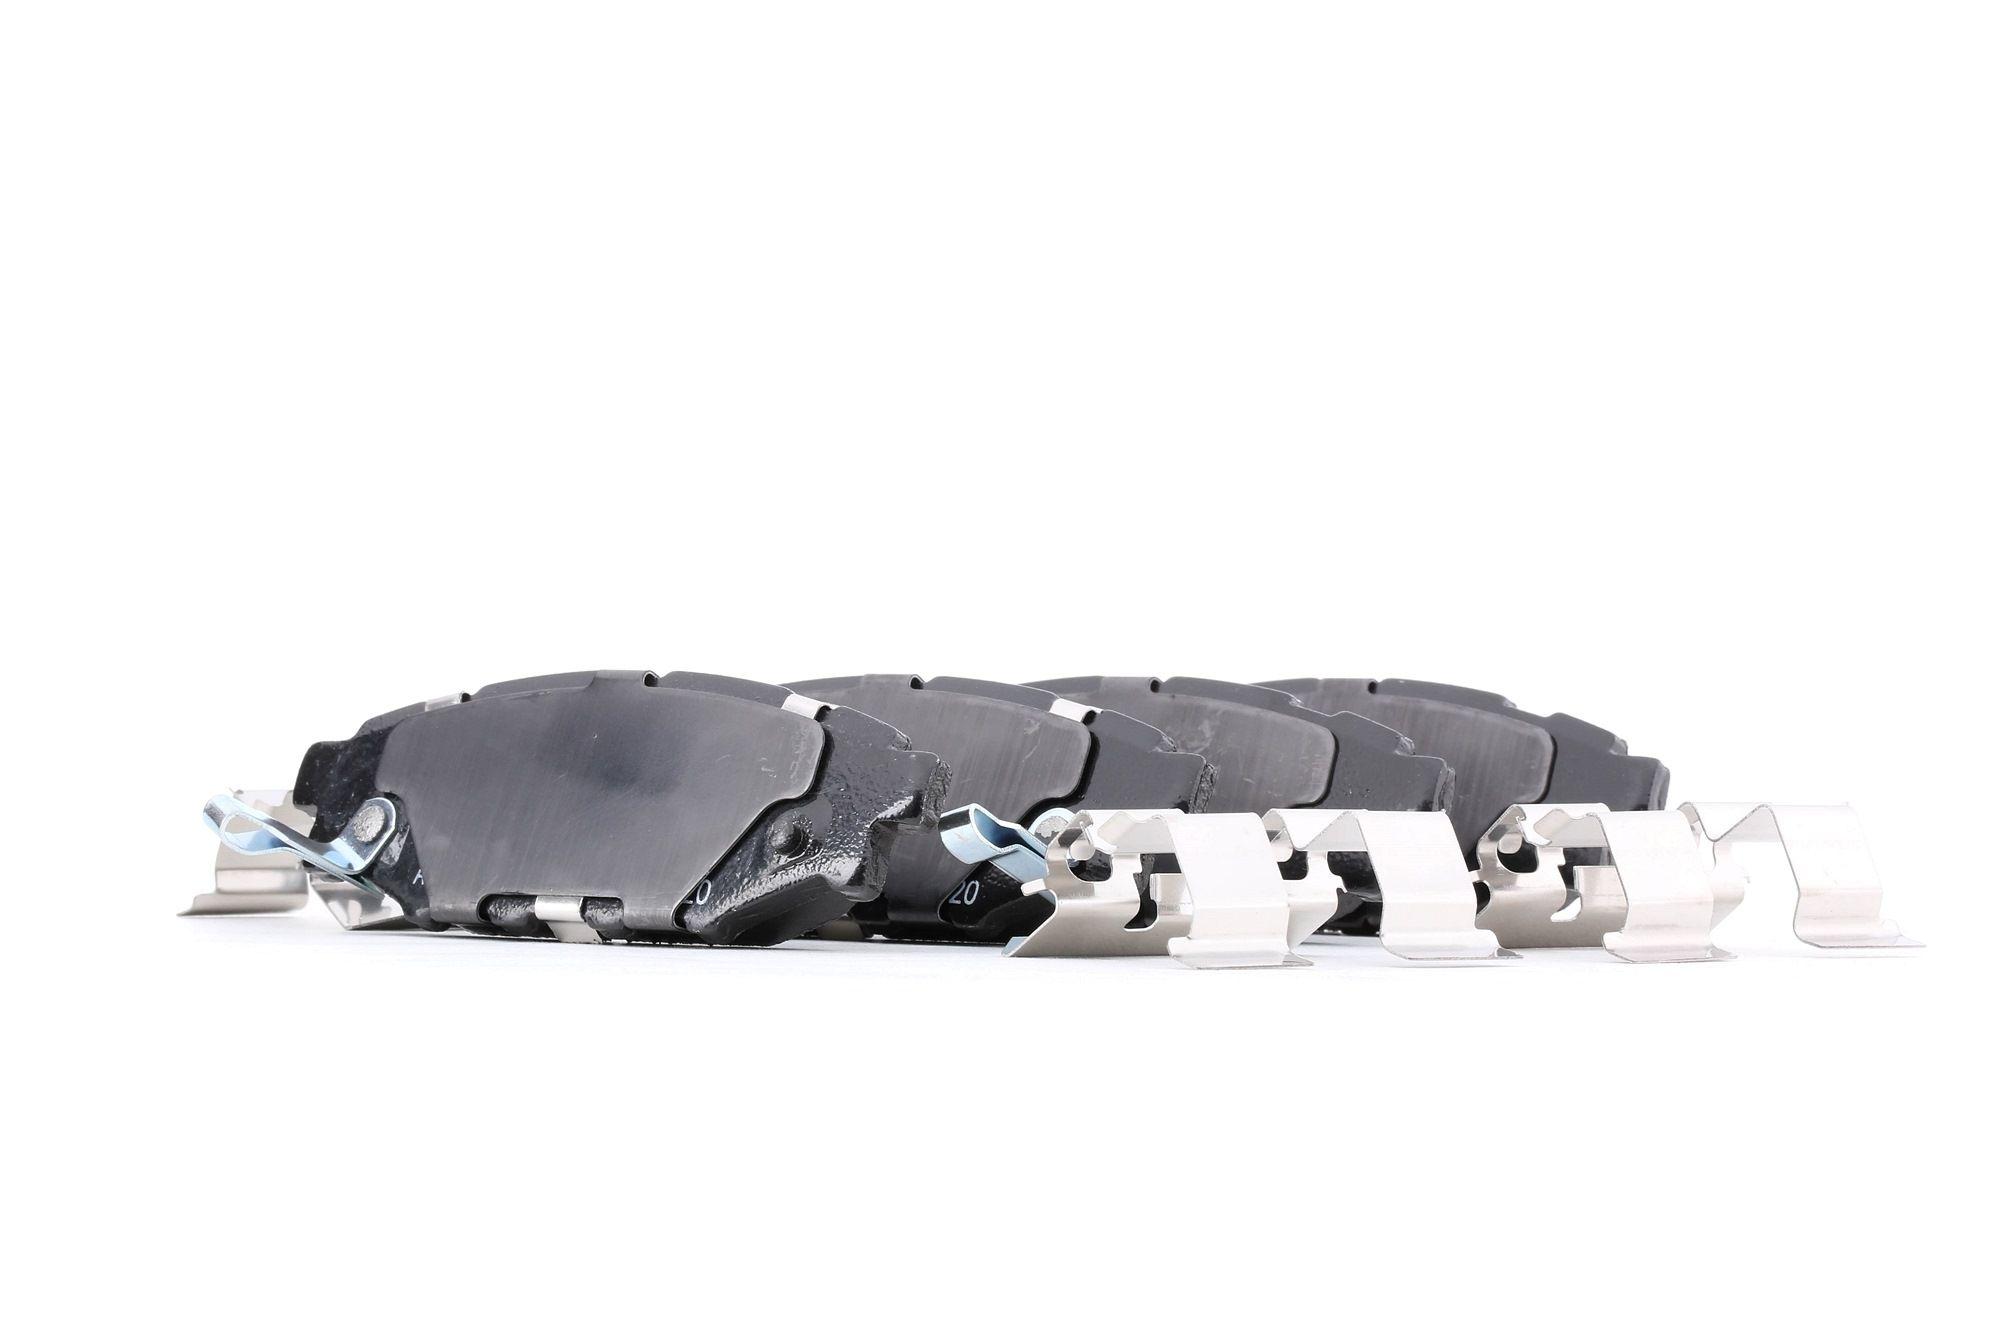 SUBARU LEGACY 2014 Bremsbelagsatz - Original ATE 13.0460-5669.2 Höhe: 37,4mm, Breite: 110,4mm, Dicke/Stärke: 13,9mm